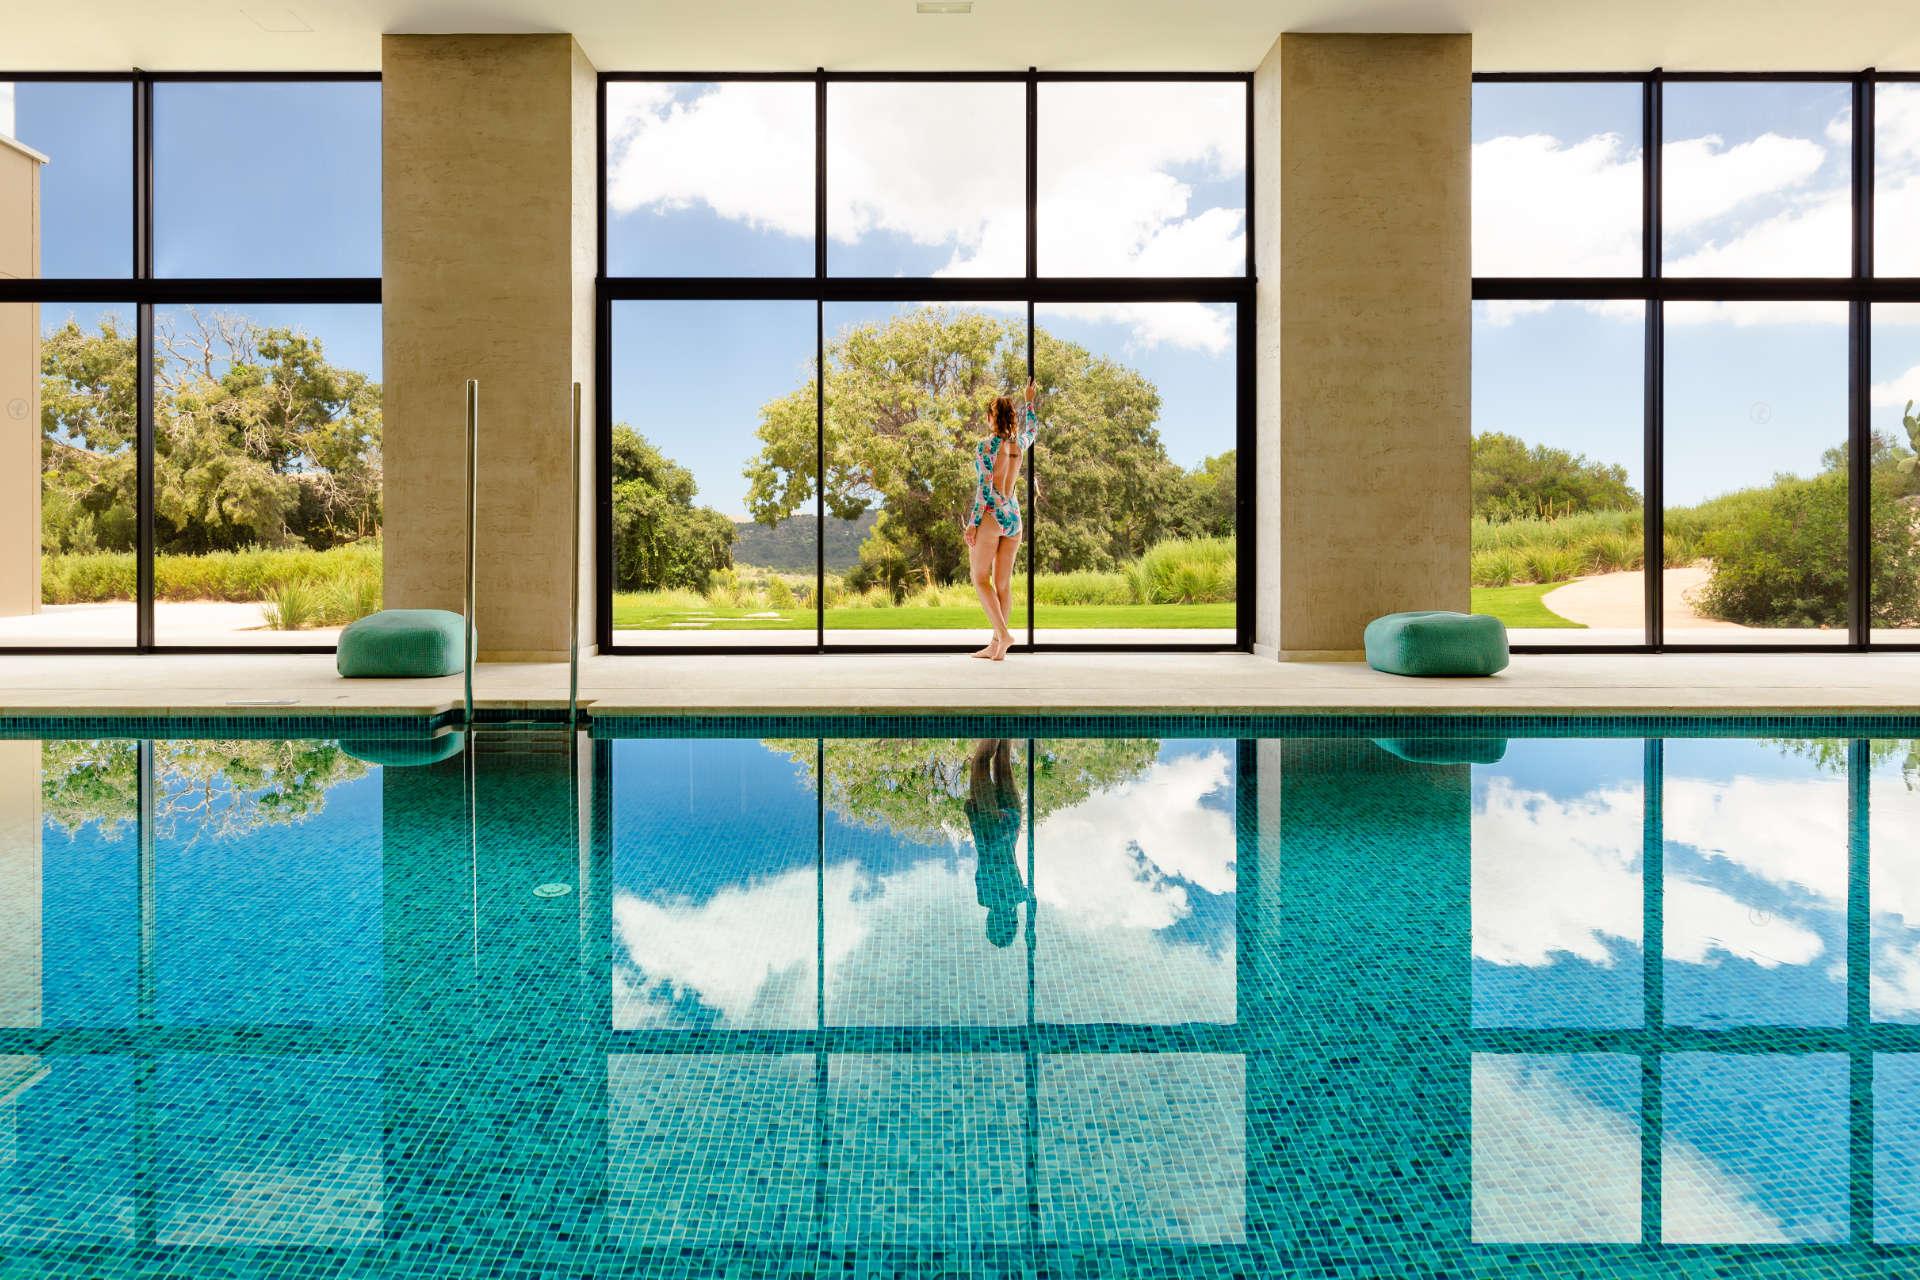 Carrossa Hotel Spa Villas Mallorca Indoorpool